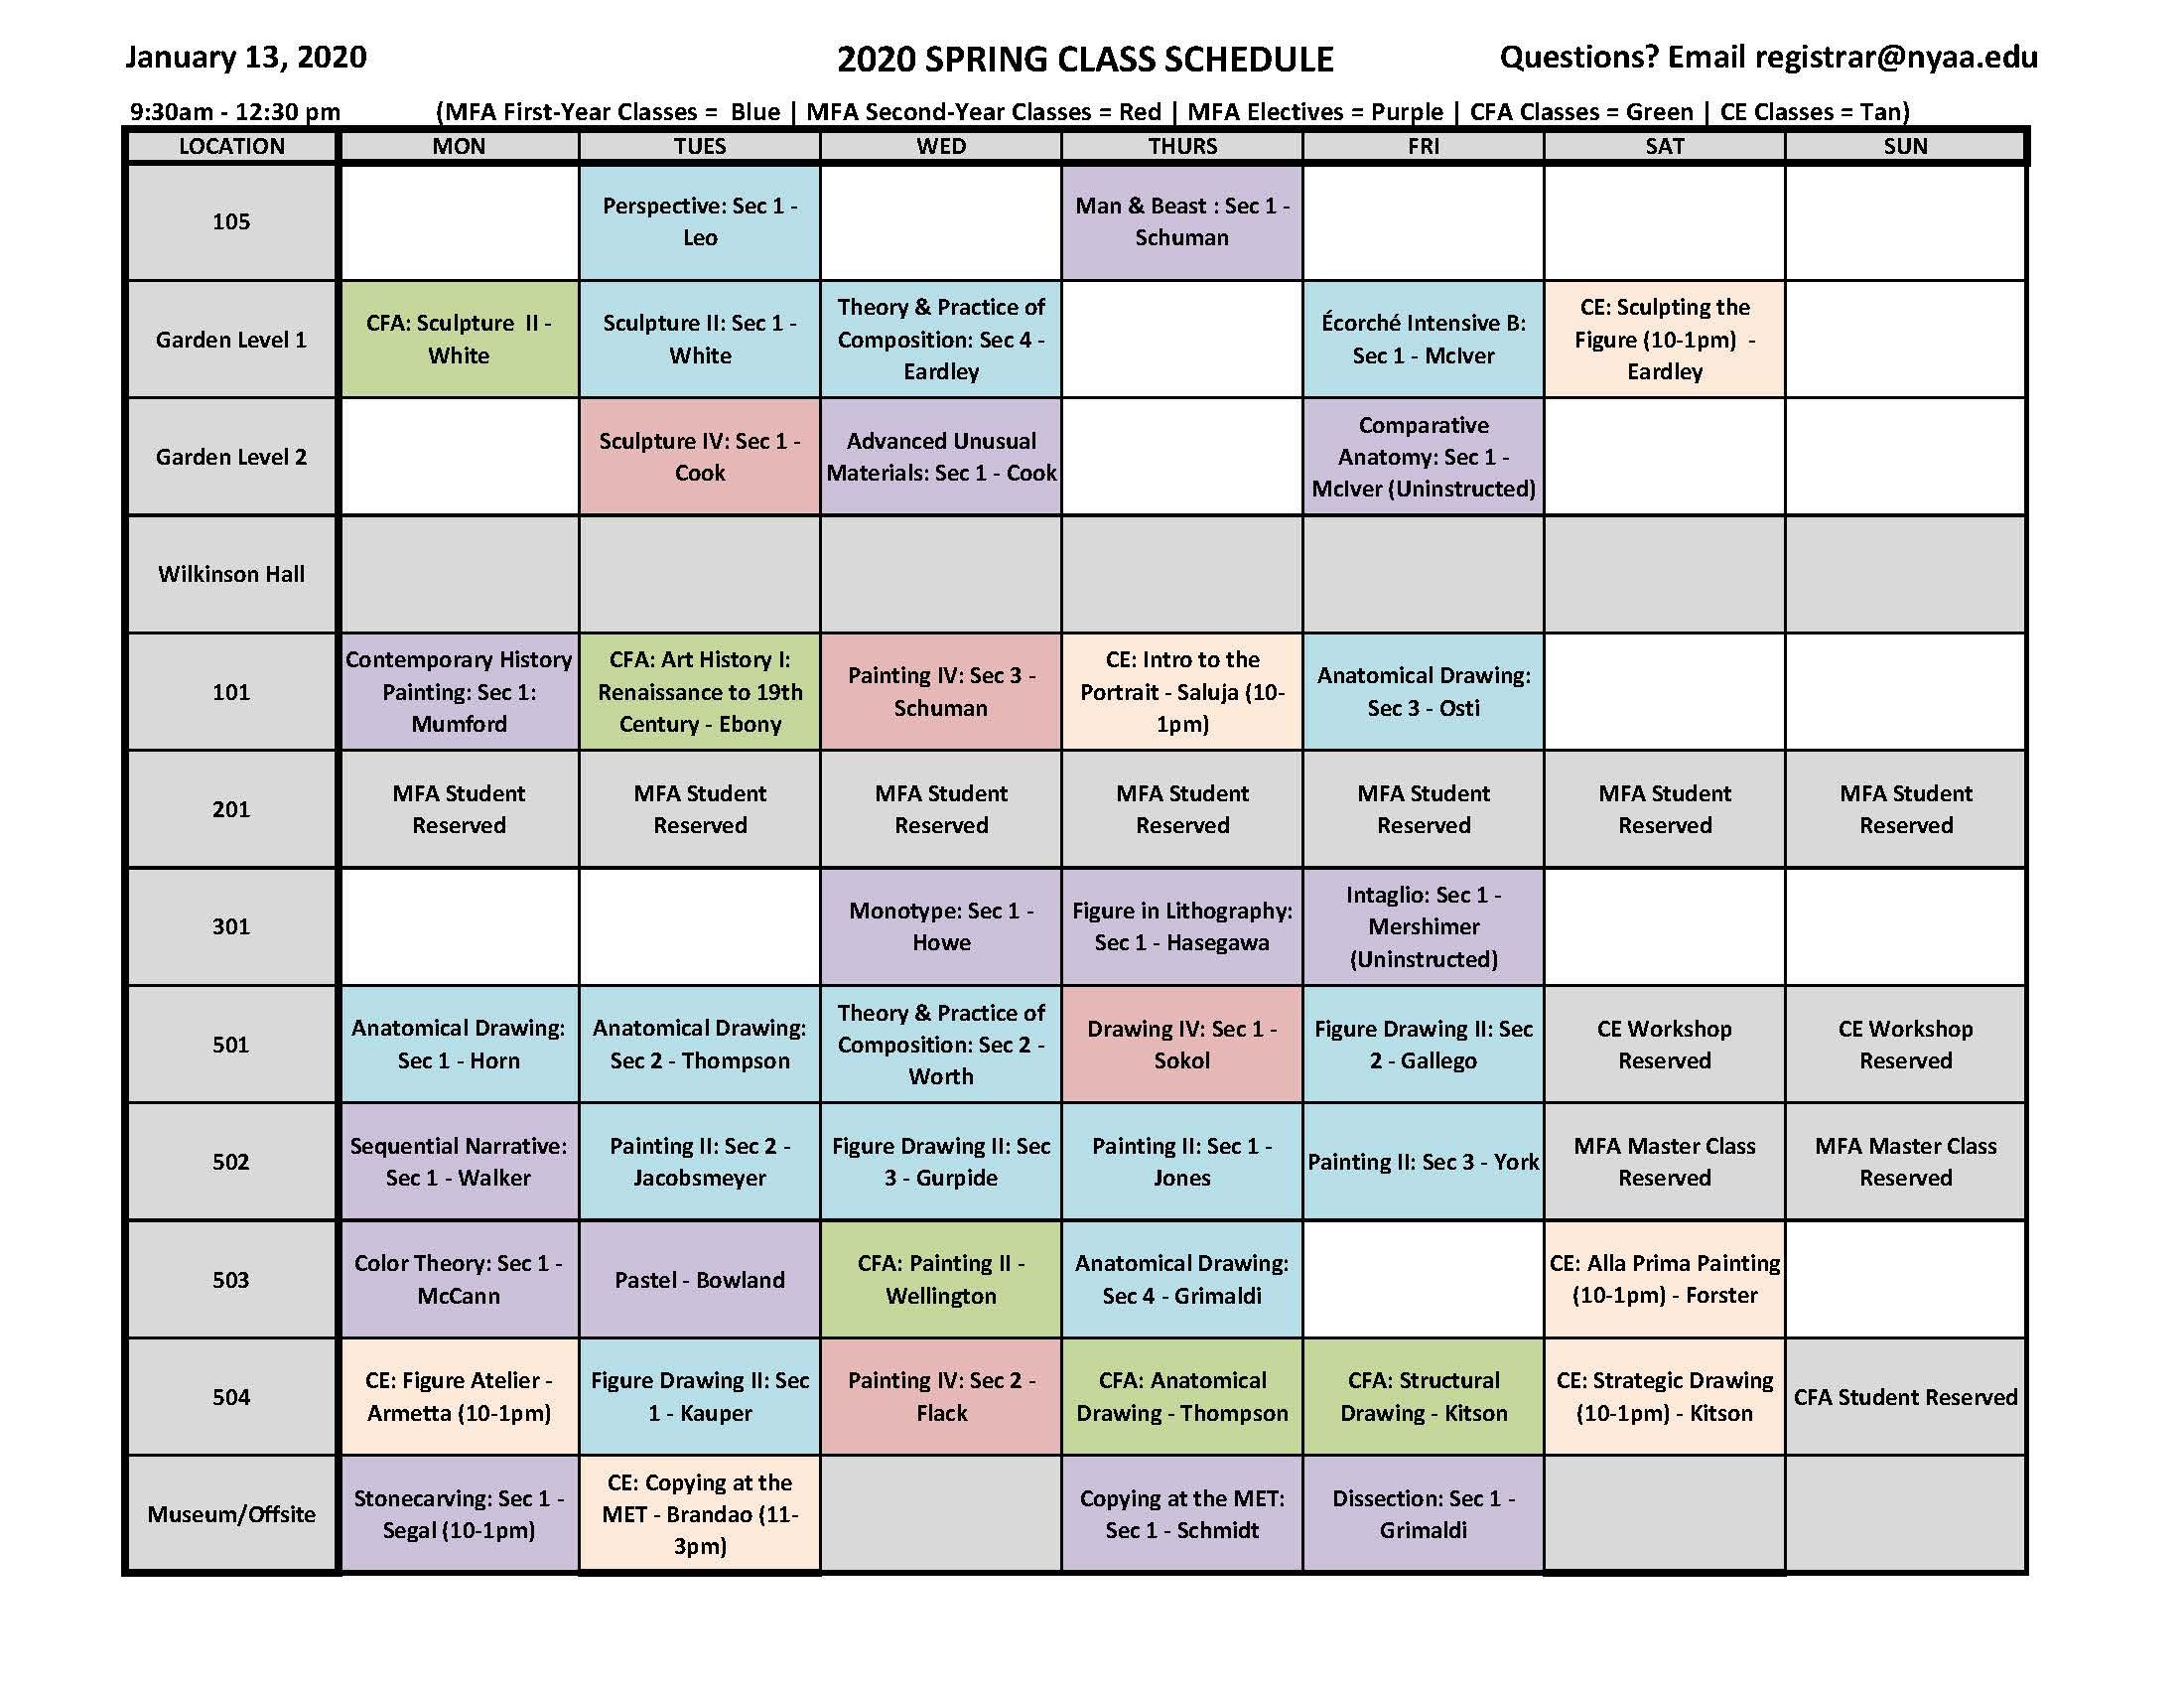 cuny calendar spring 2020